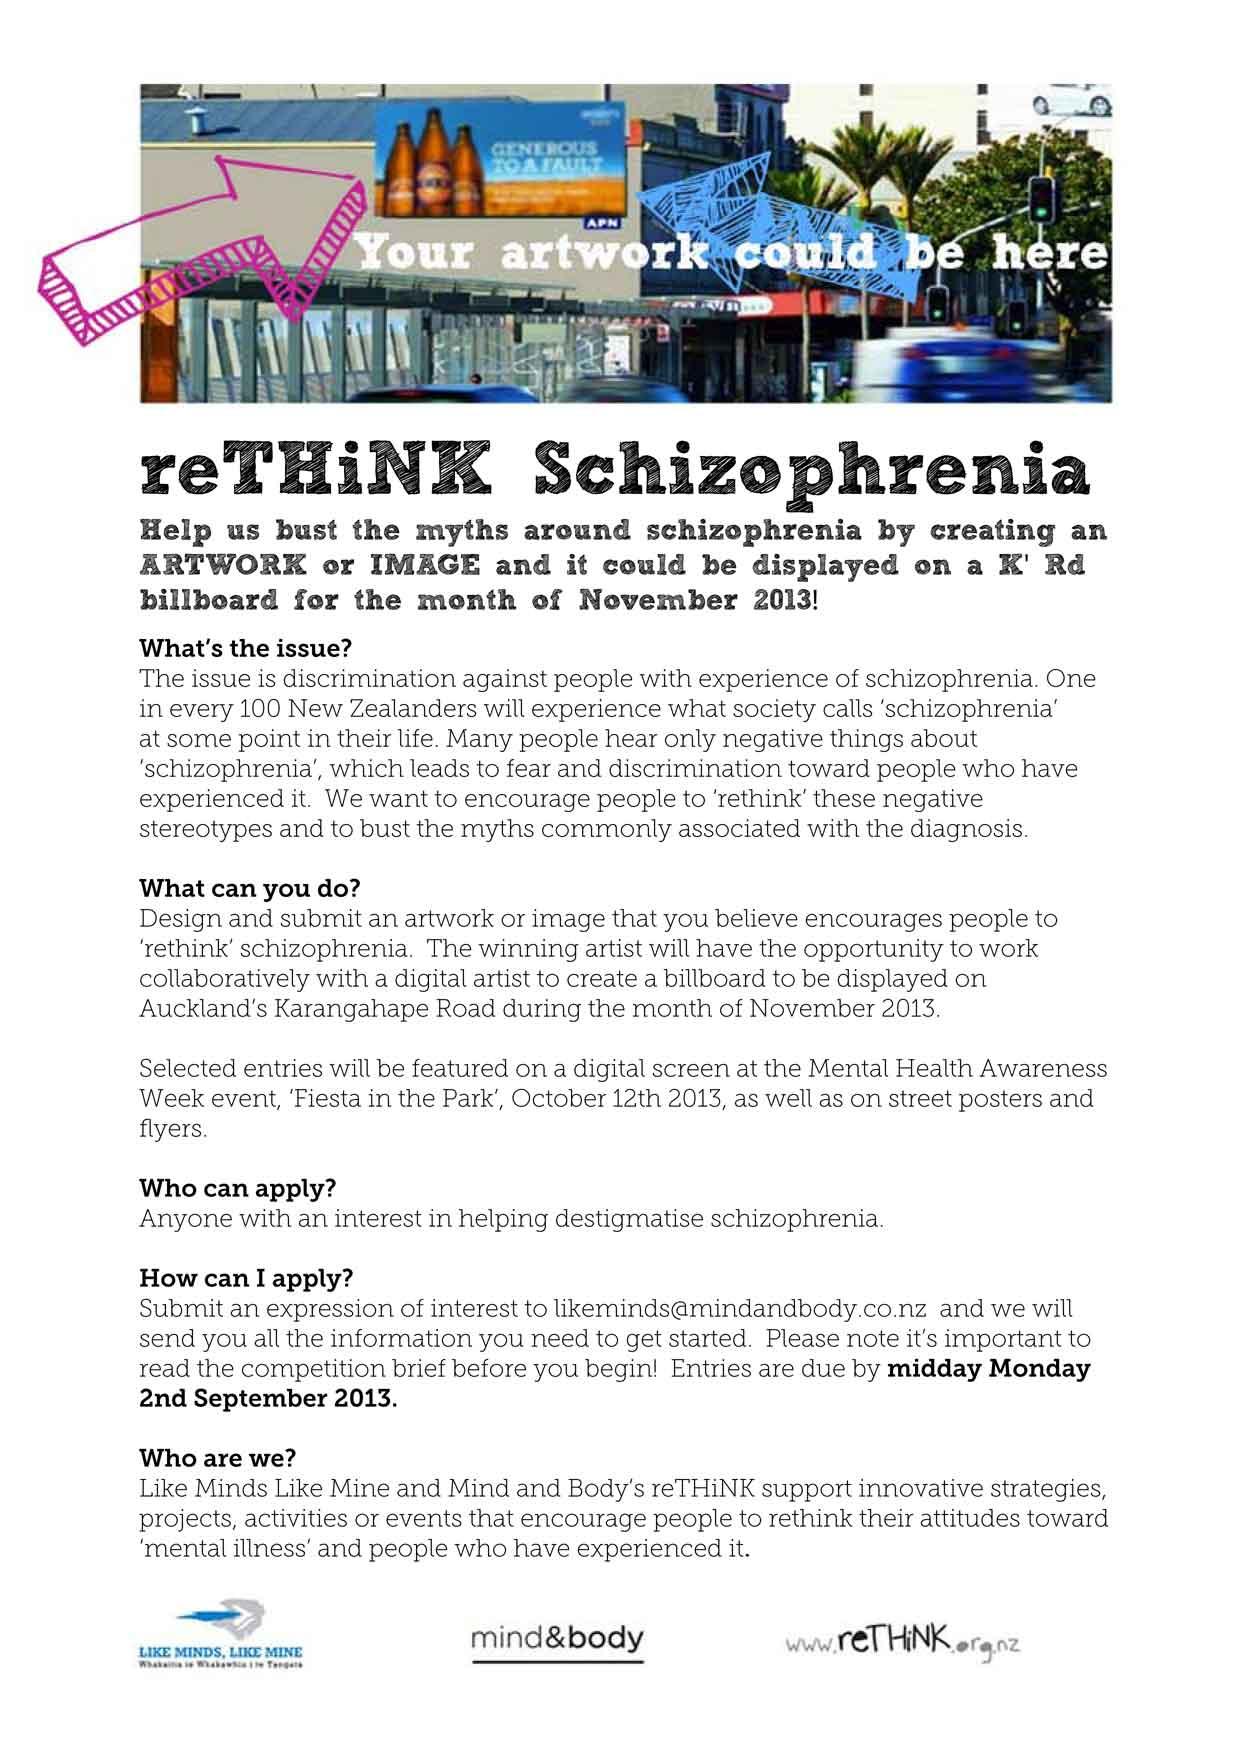 Schizophrenia and dating